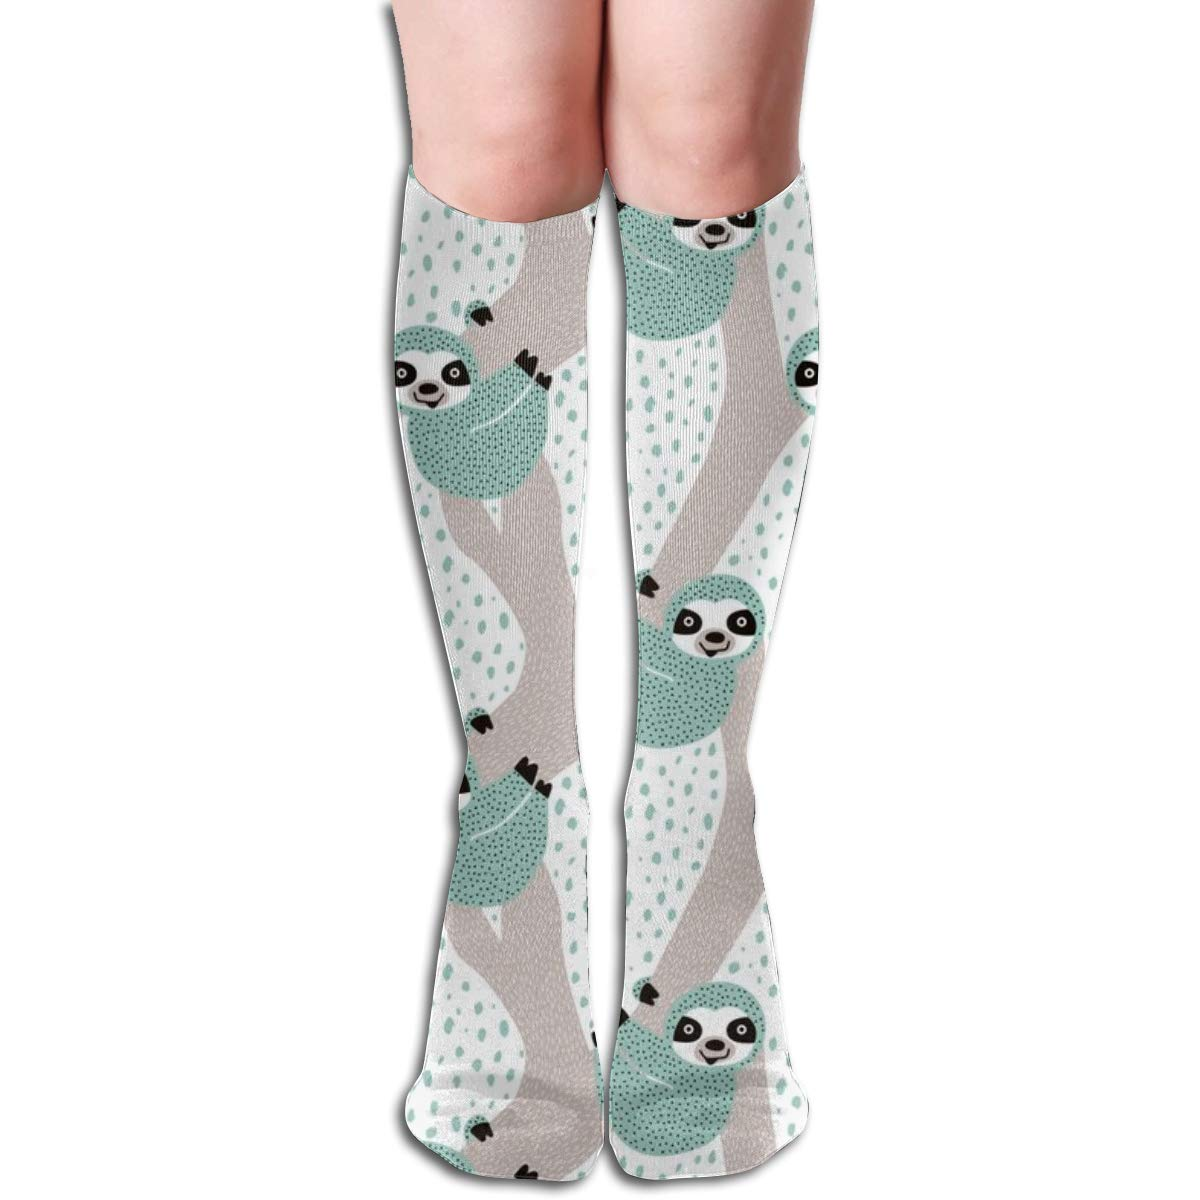 Blue Sloths Just Hang In These Pura Vida Jungle Animals Boys Elastic Mix 50cm High Socks Sports Stockings Long Compression Socks